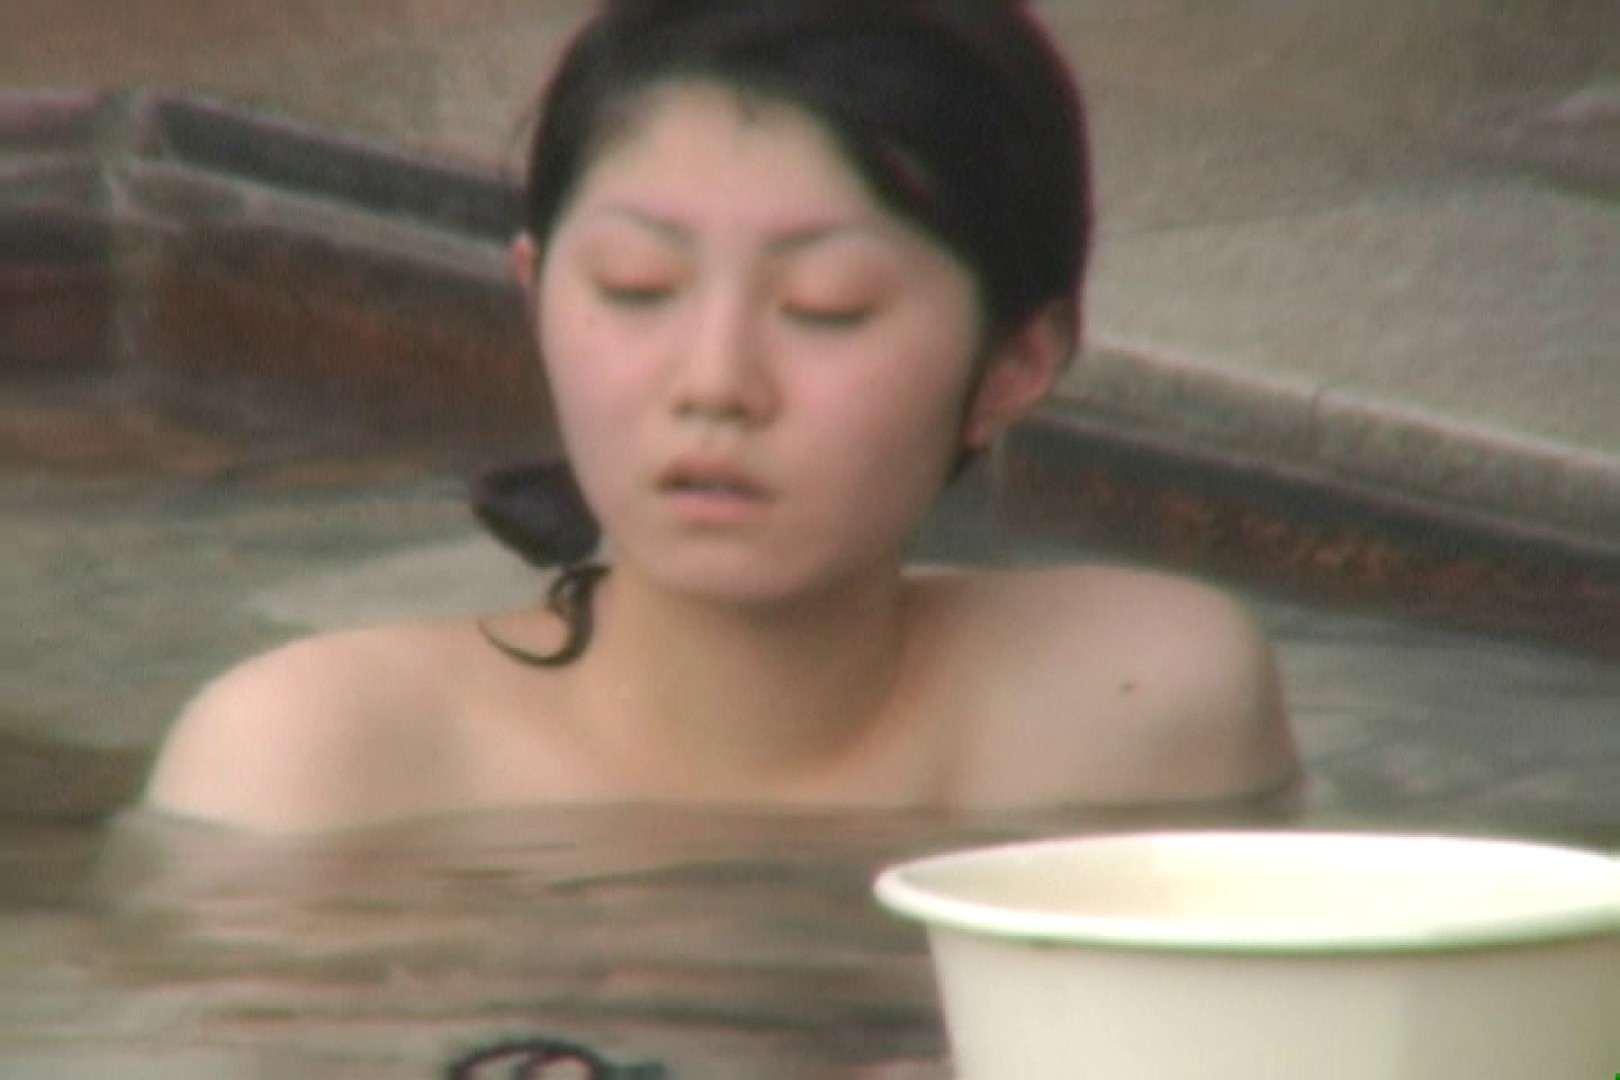 Aquaな露天風呂Vol.579 盗撮 | HなOL  53pic 31